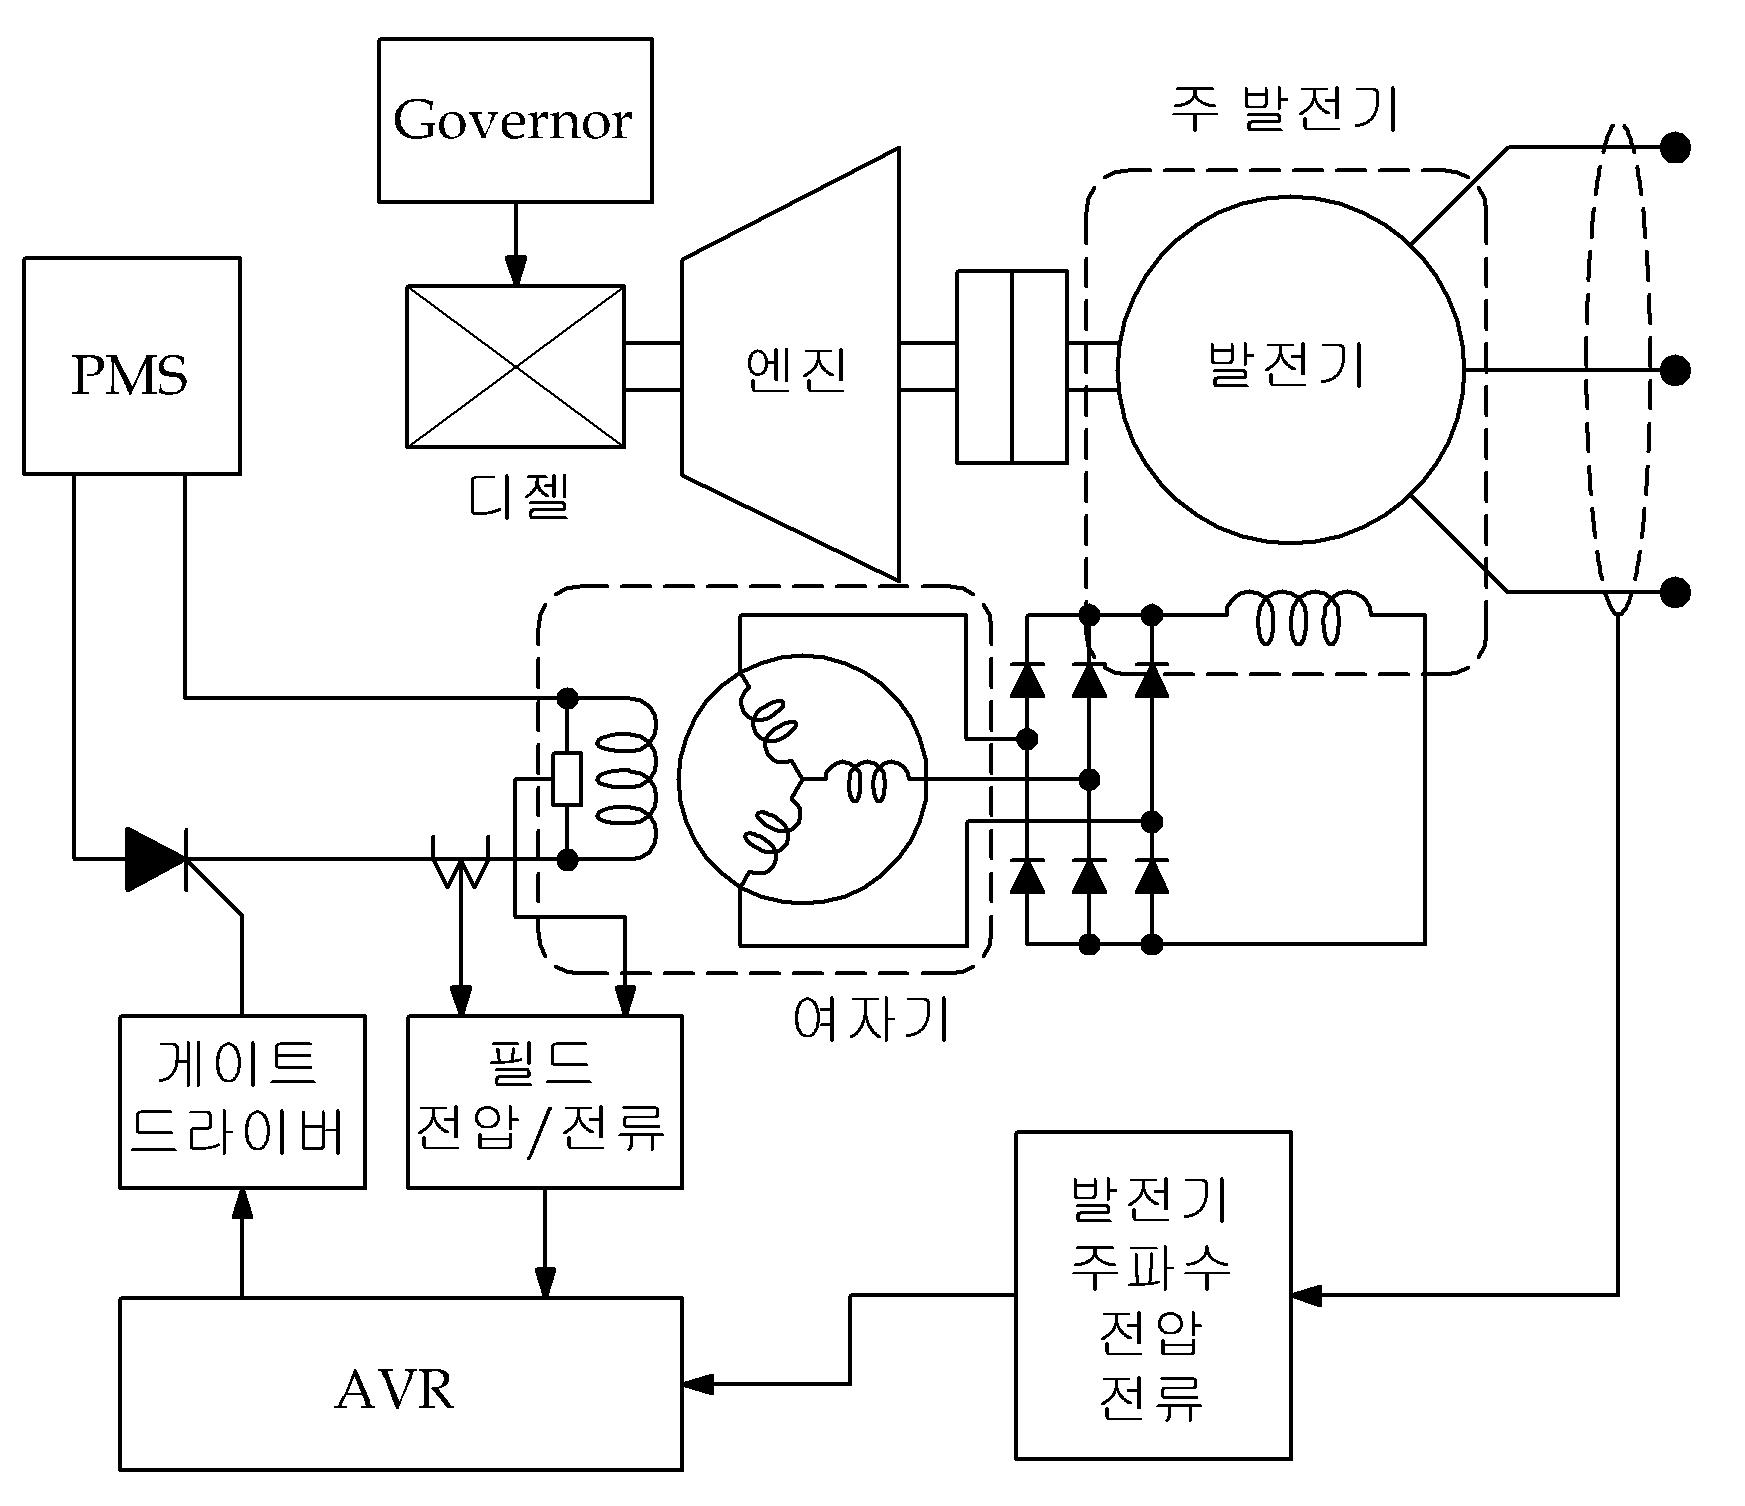 patent wo2010032954a2